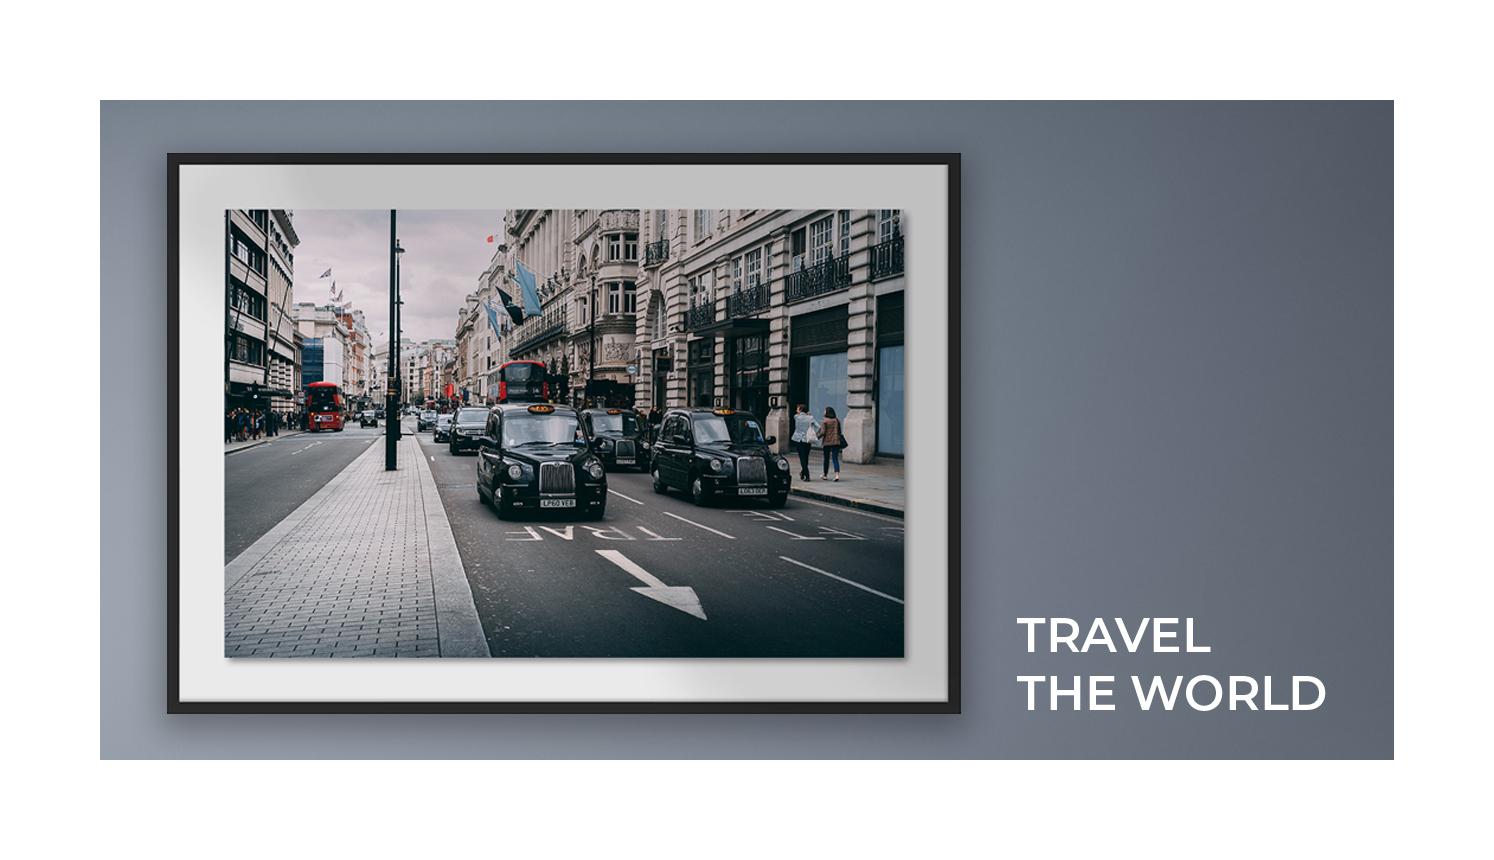 traveltheworld.jpg